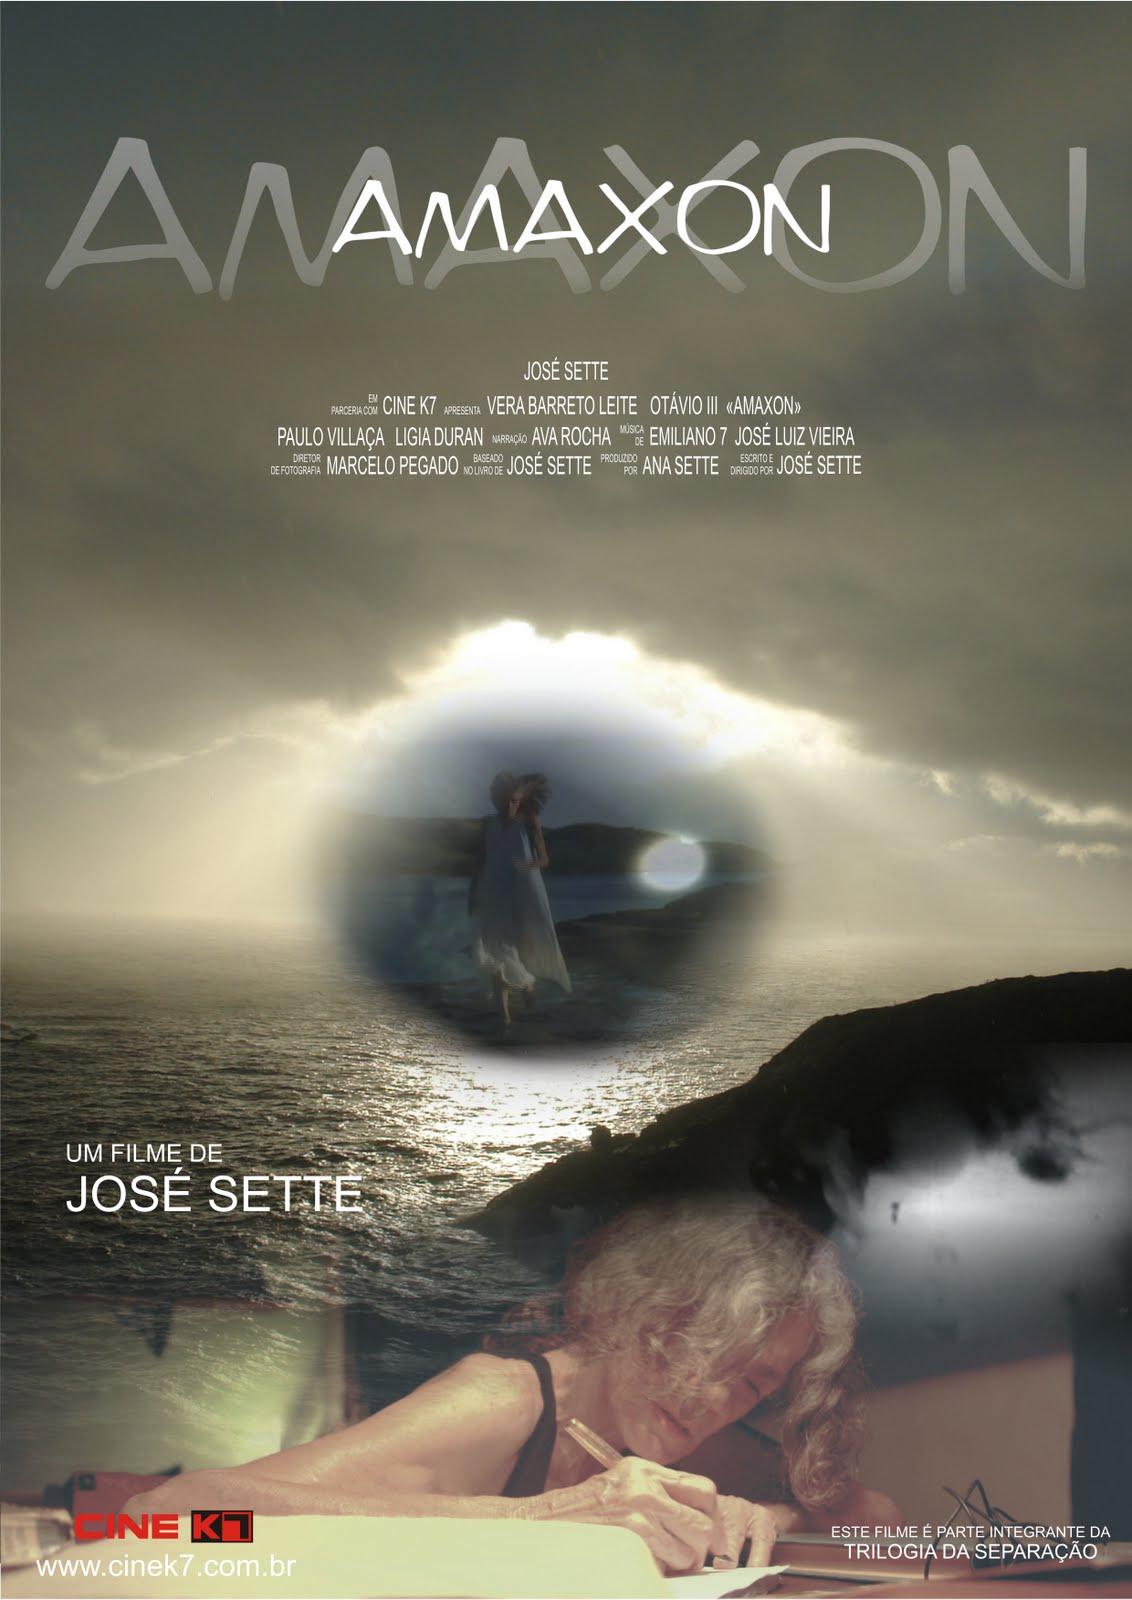 Resultado de imagem para Amaxon (José Sette) filme